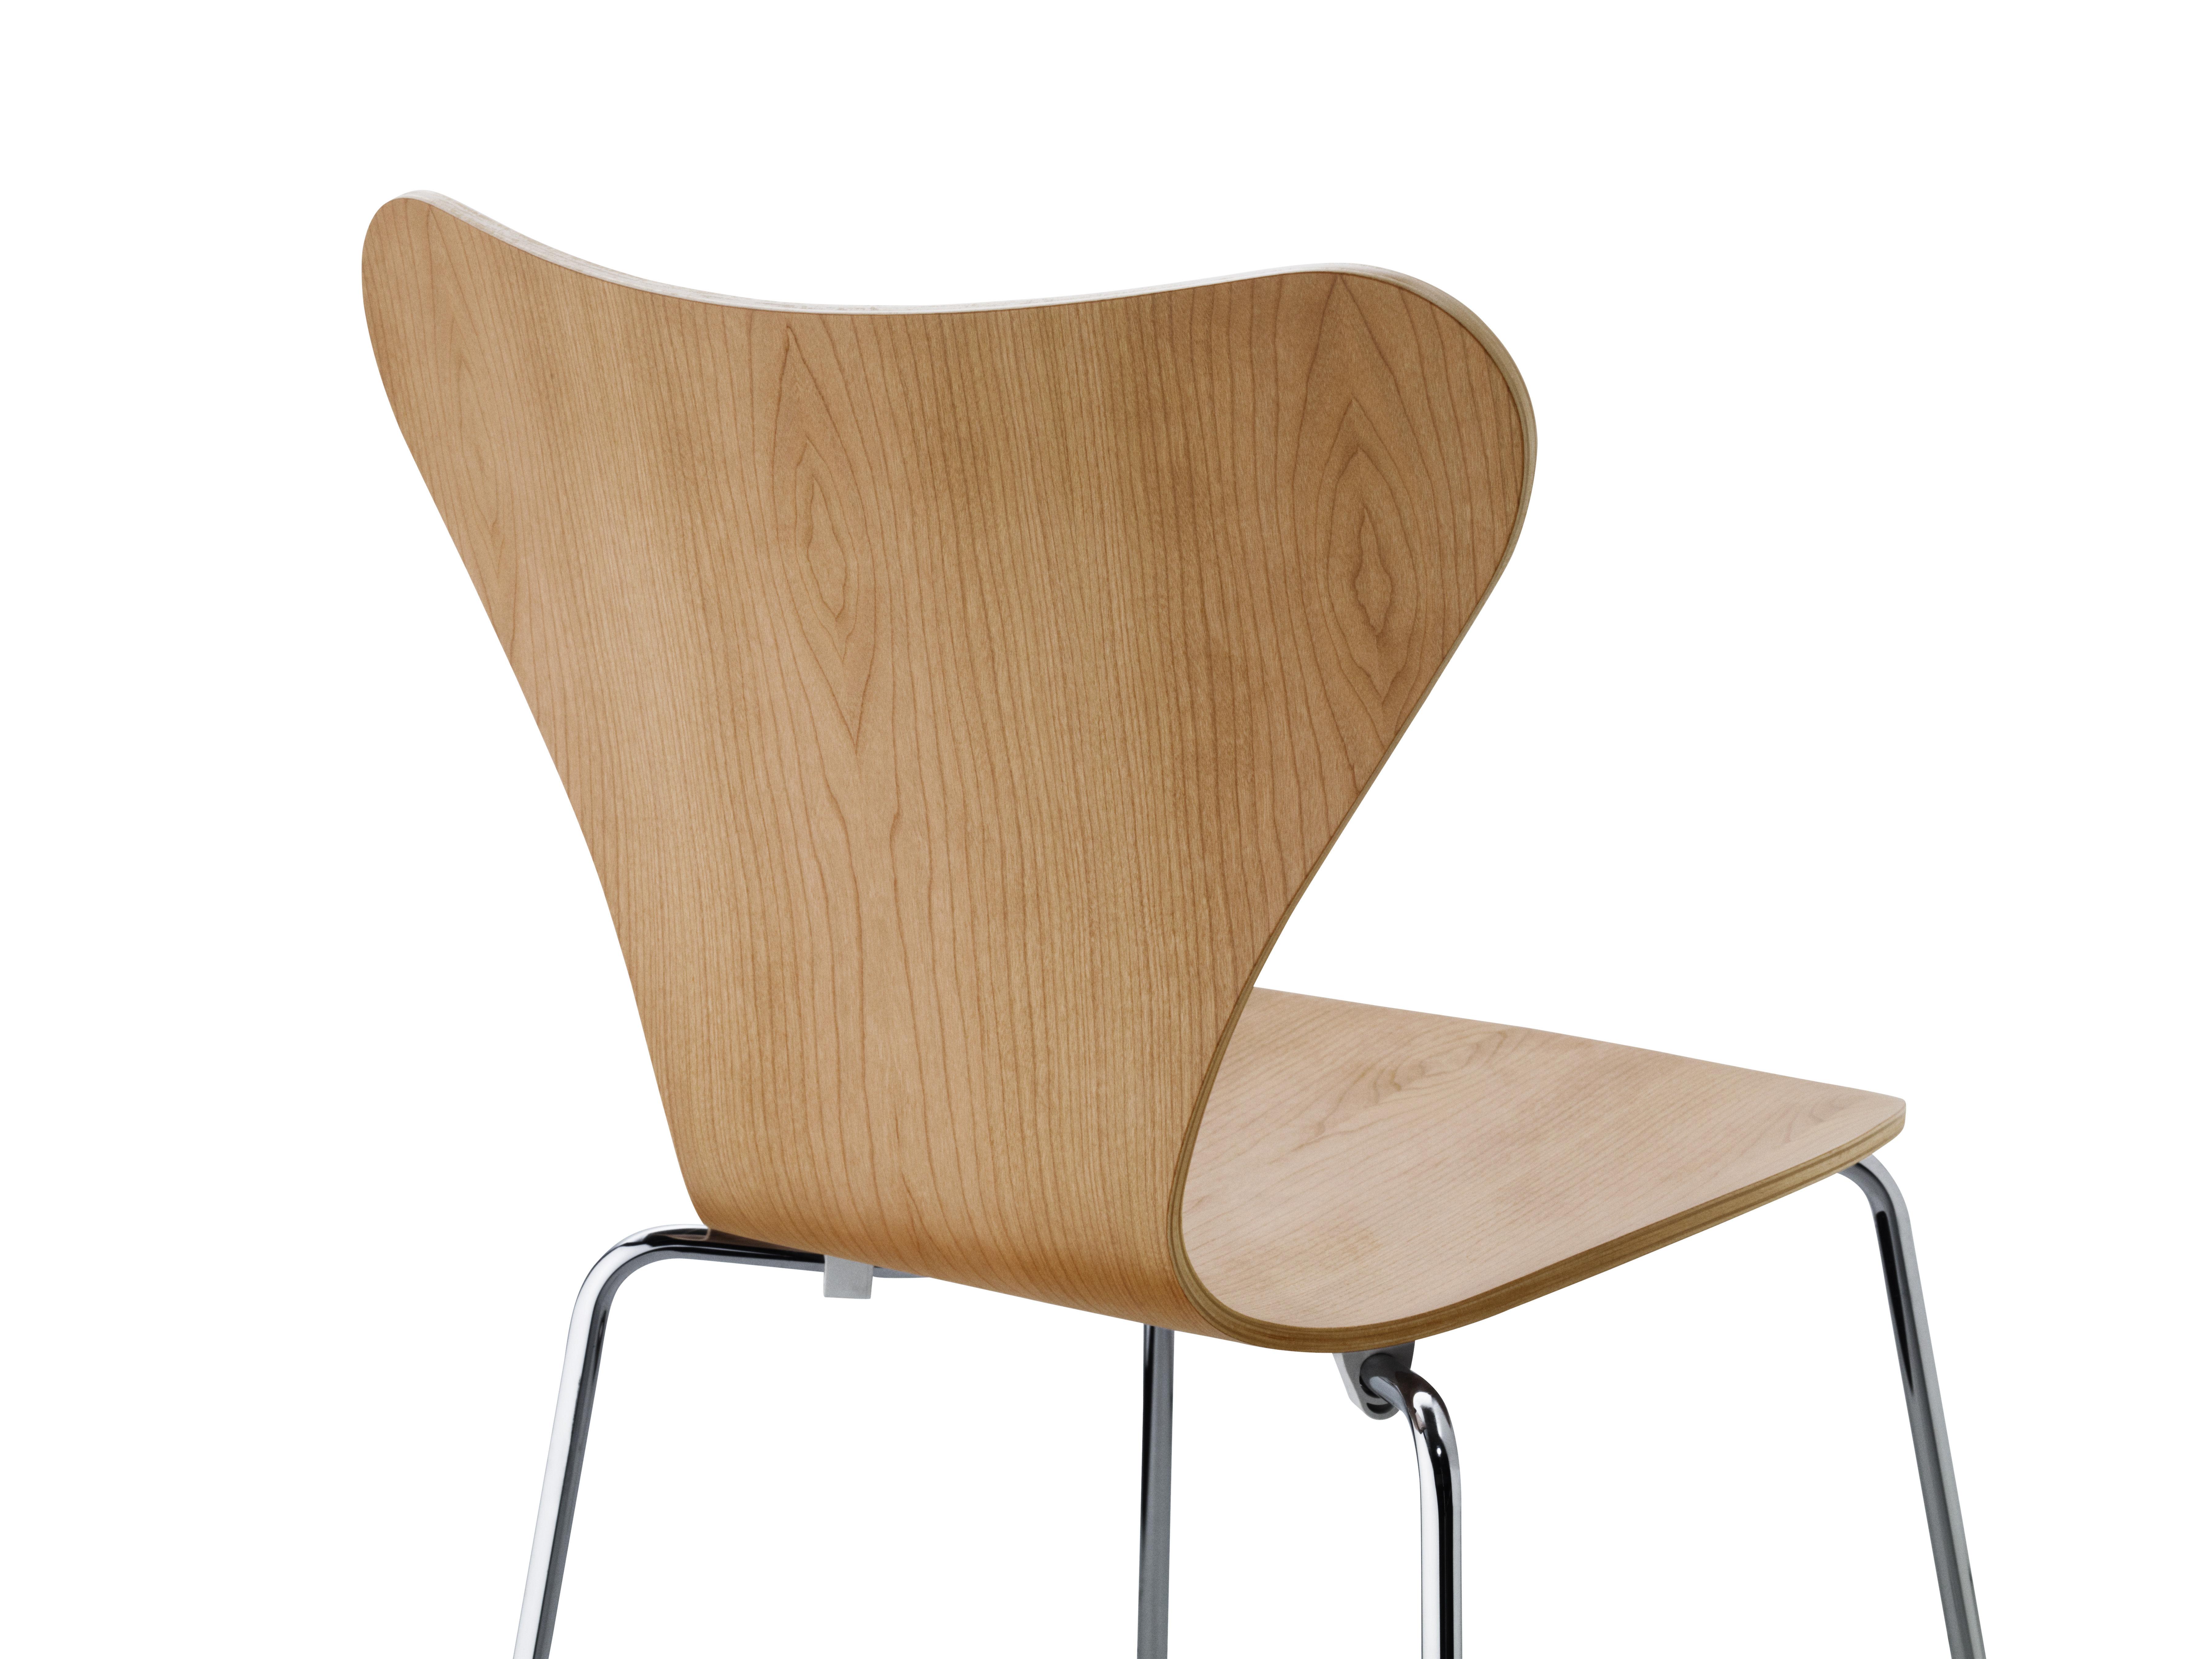 chaise empilable s rie 7 bois naturel cerisier fritz hansen. Black Bedroom Furniture Sets. Home Design Ideas